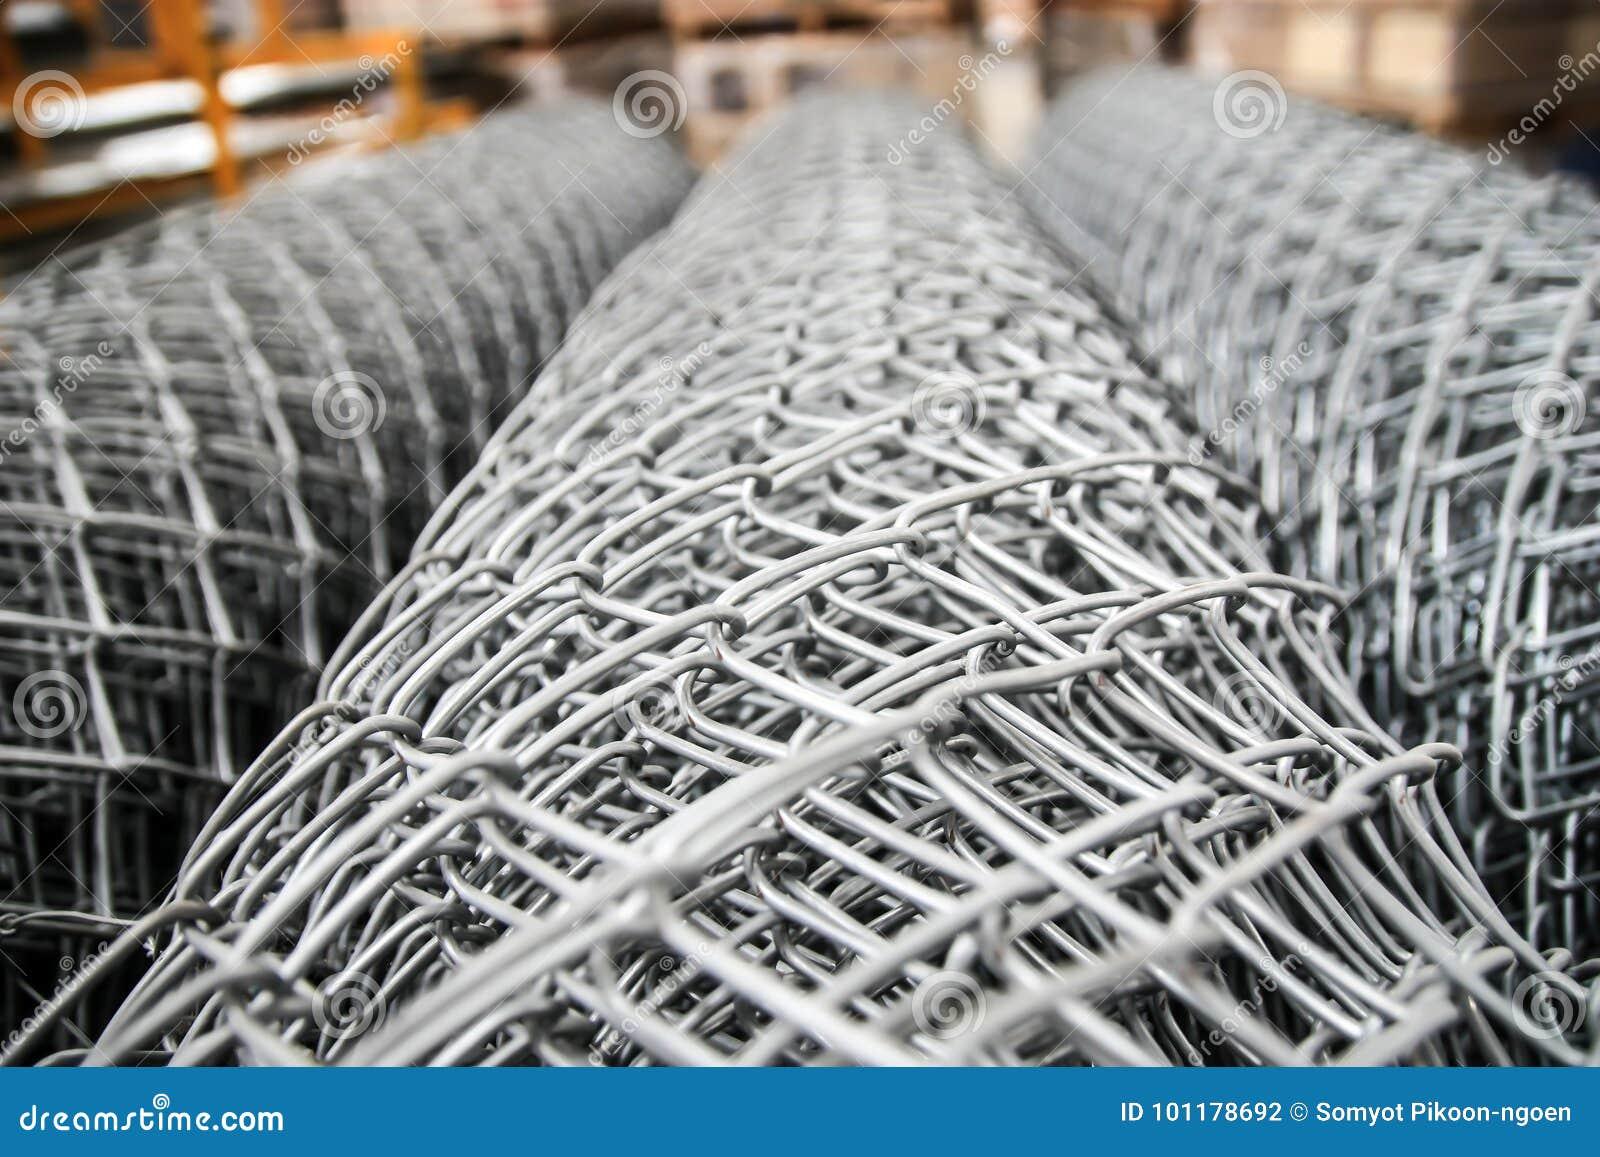 Stahlstange